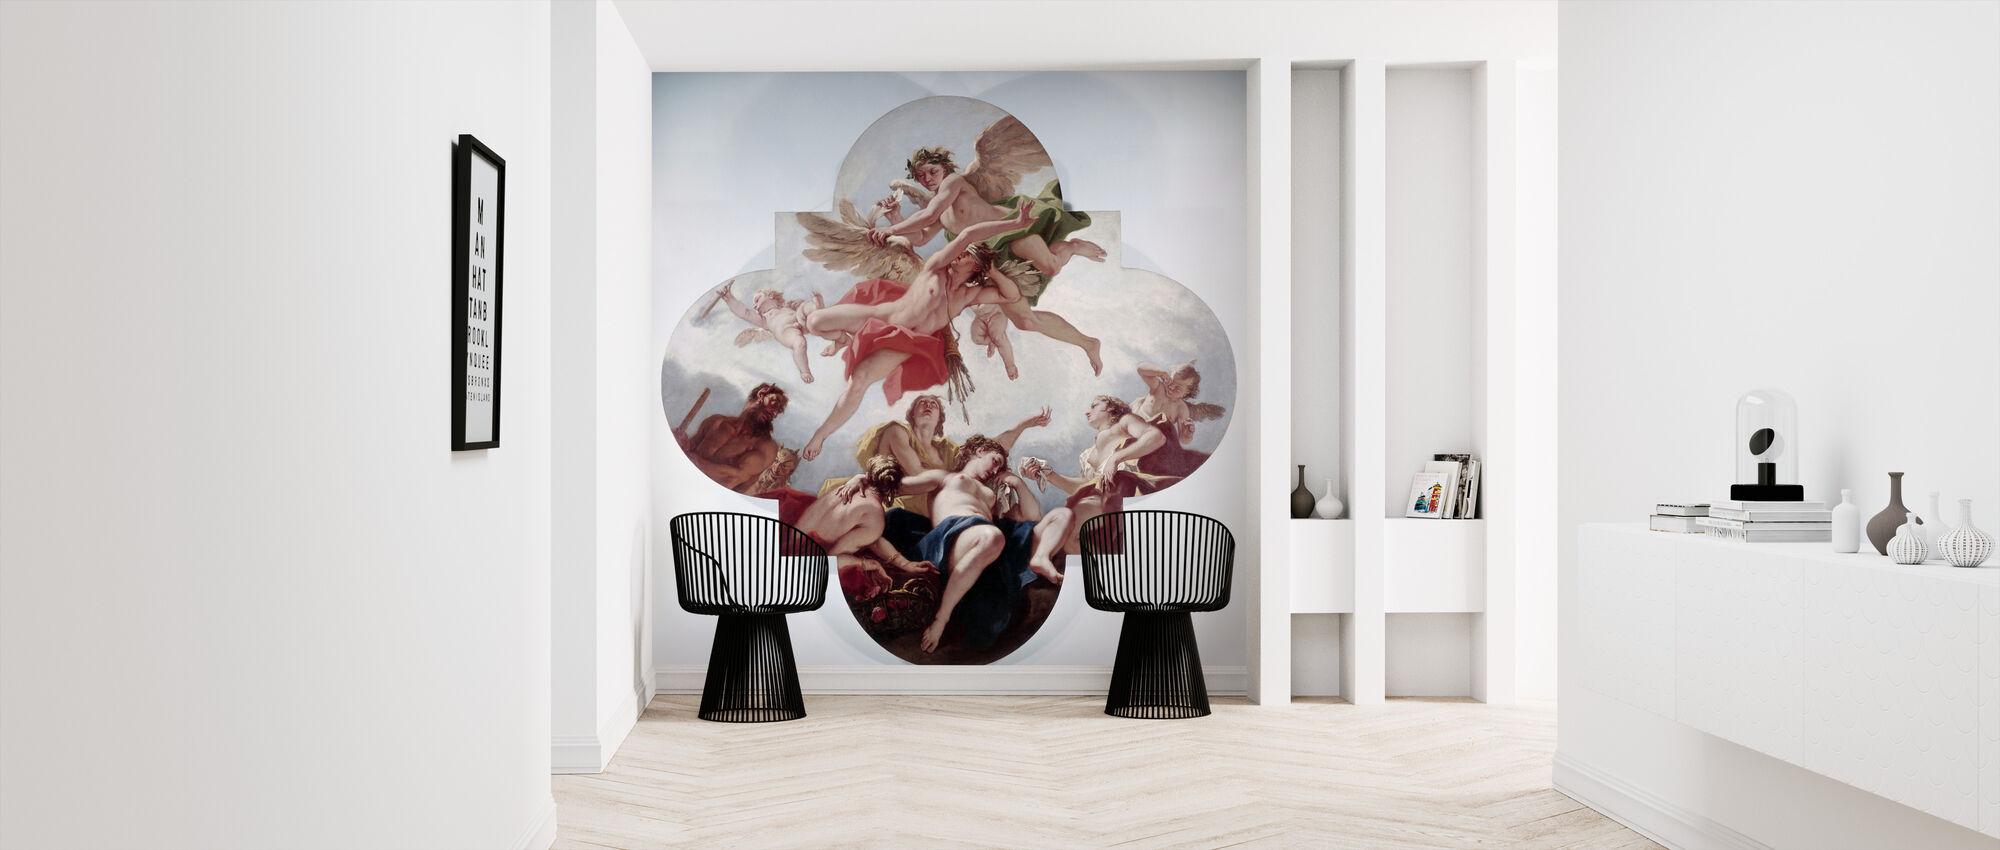 Taming Of Cupid - Sebastiano Ricci - Wallpaper - Hallway